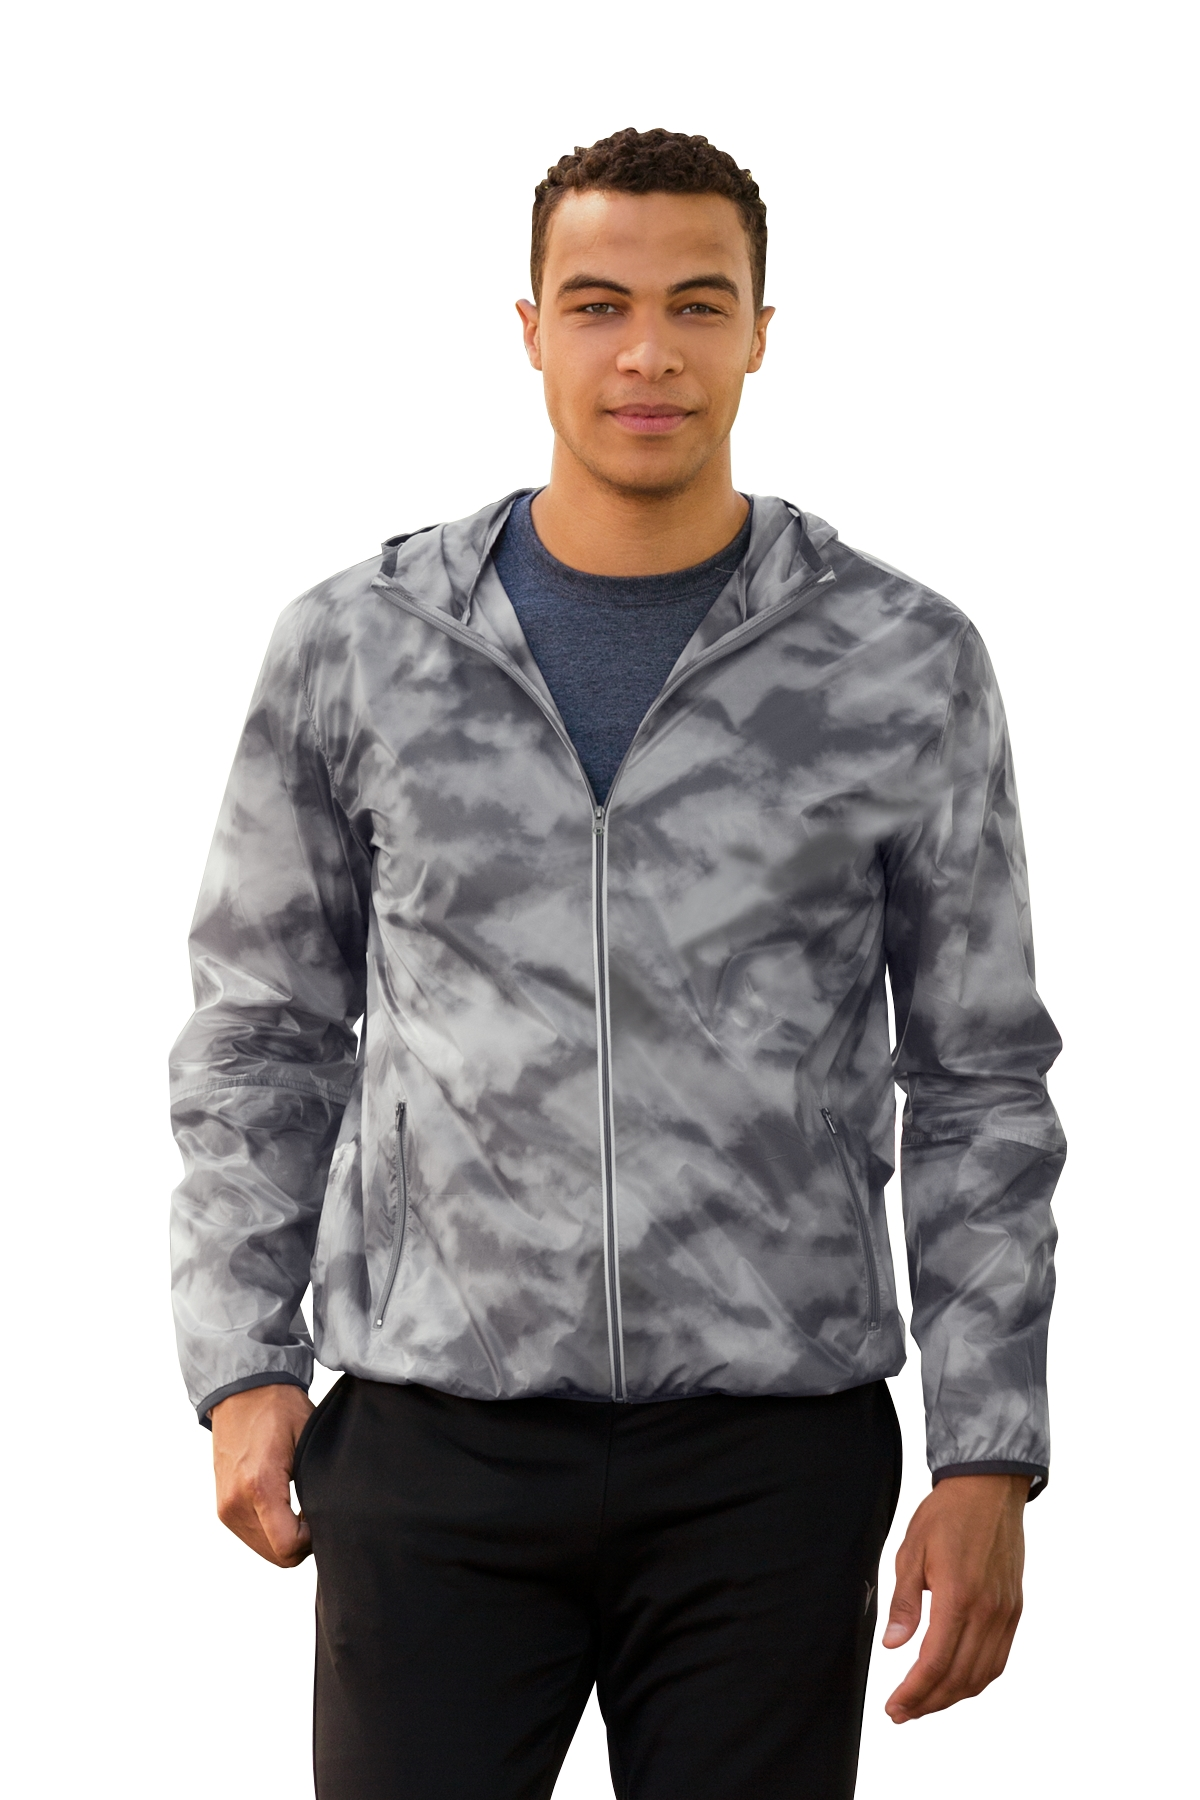 Vantage 7150 - Men's Cloud Jacket